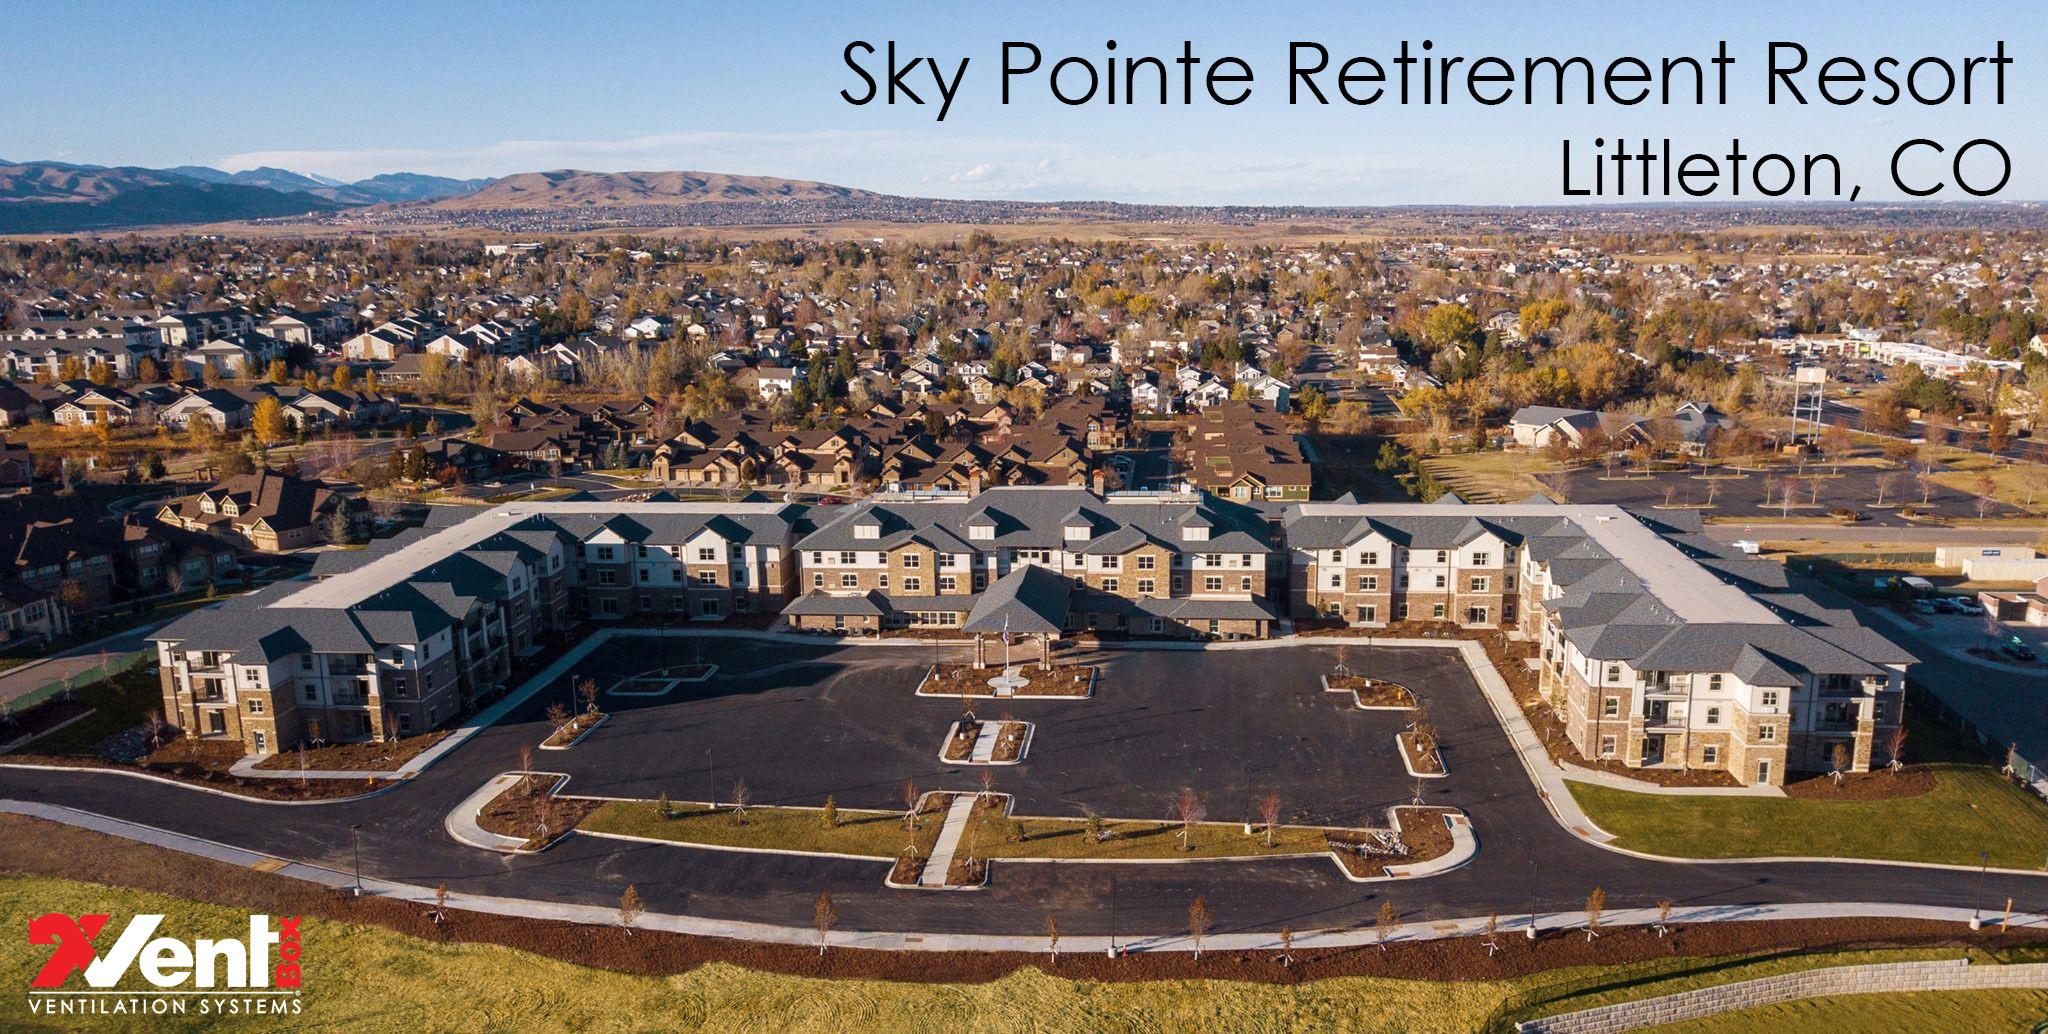 Sky Pointe Retirement Resort